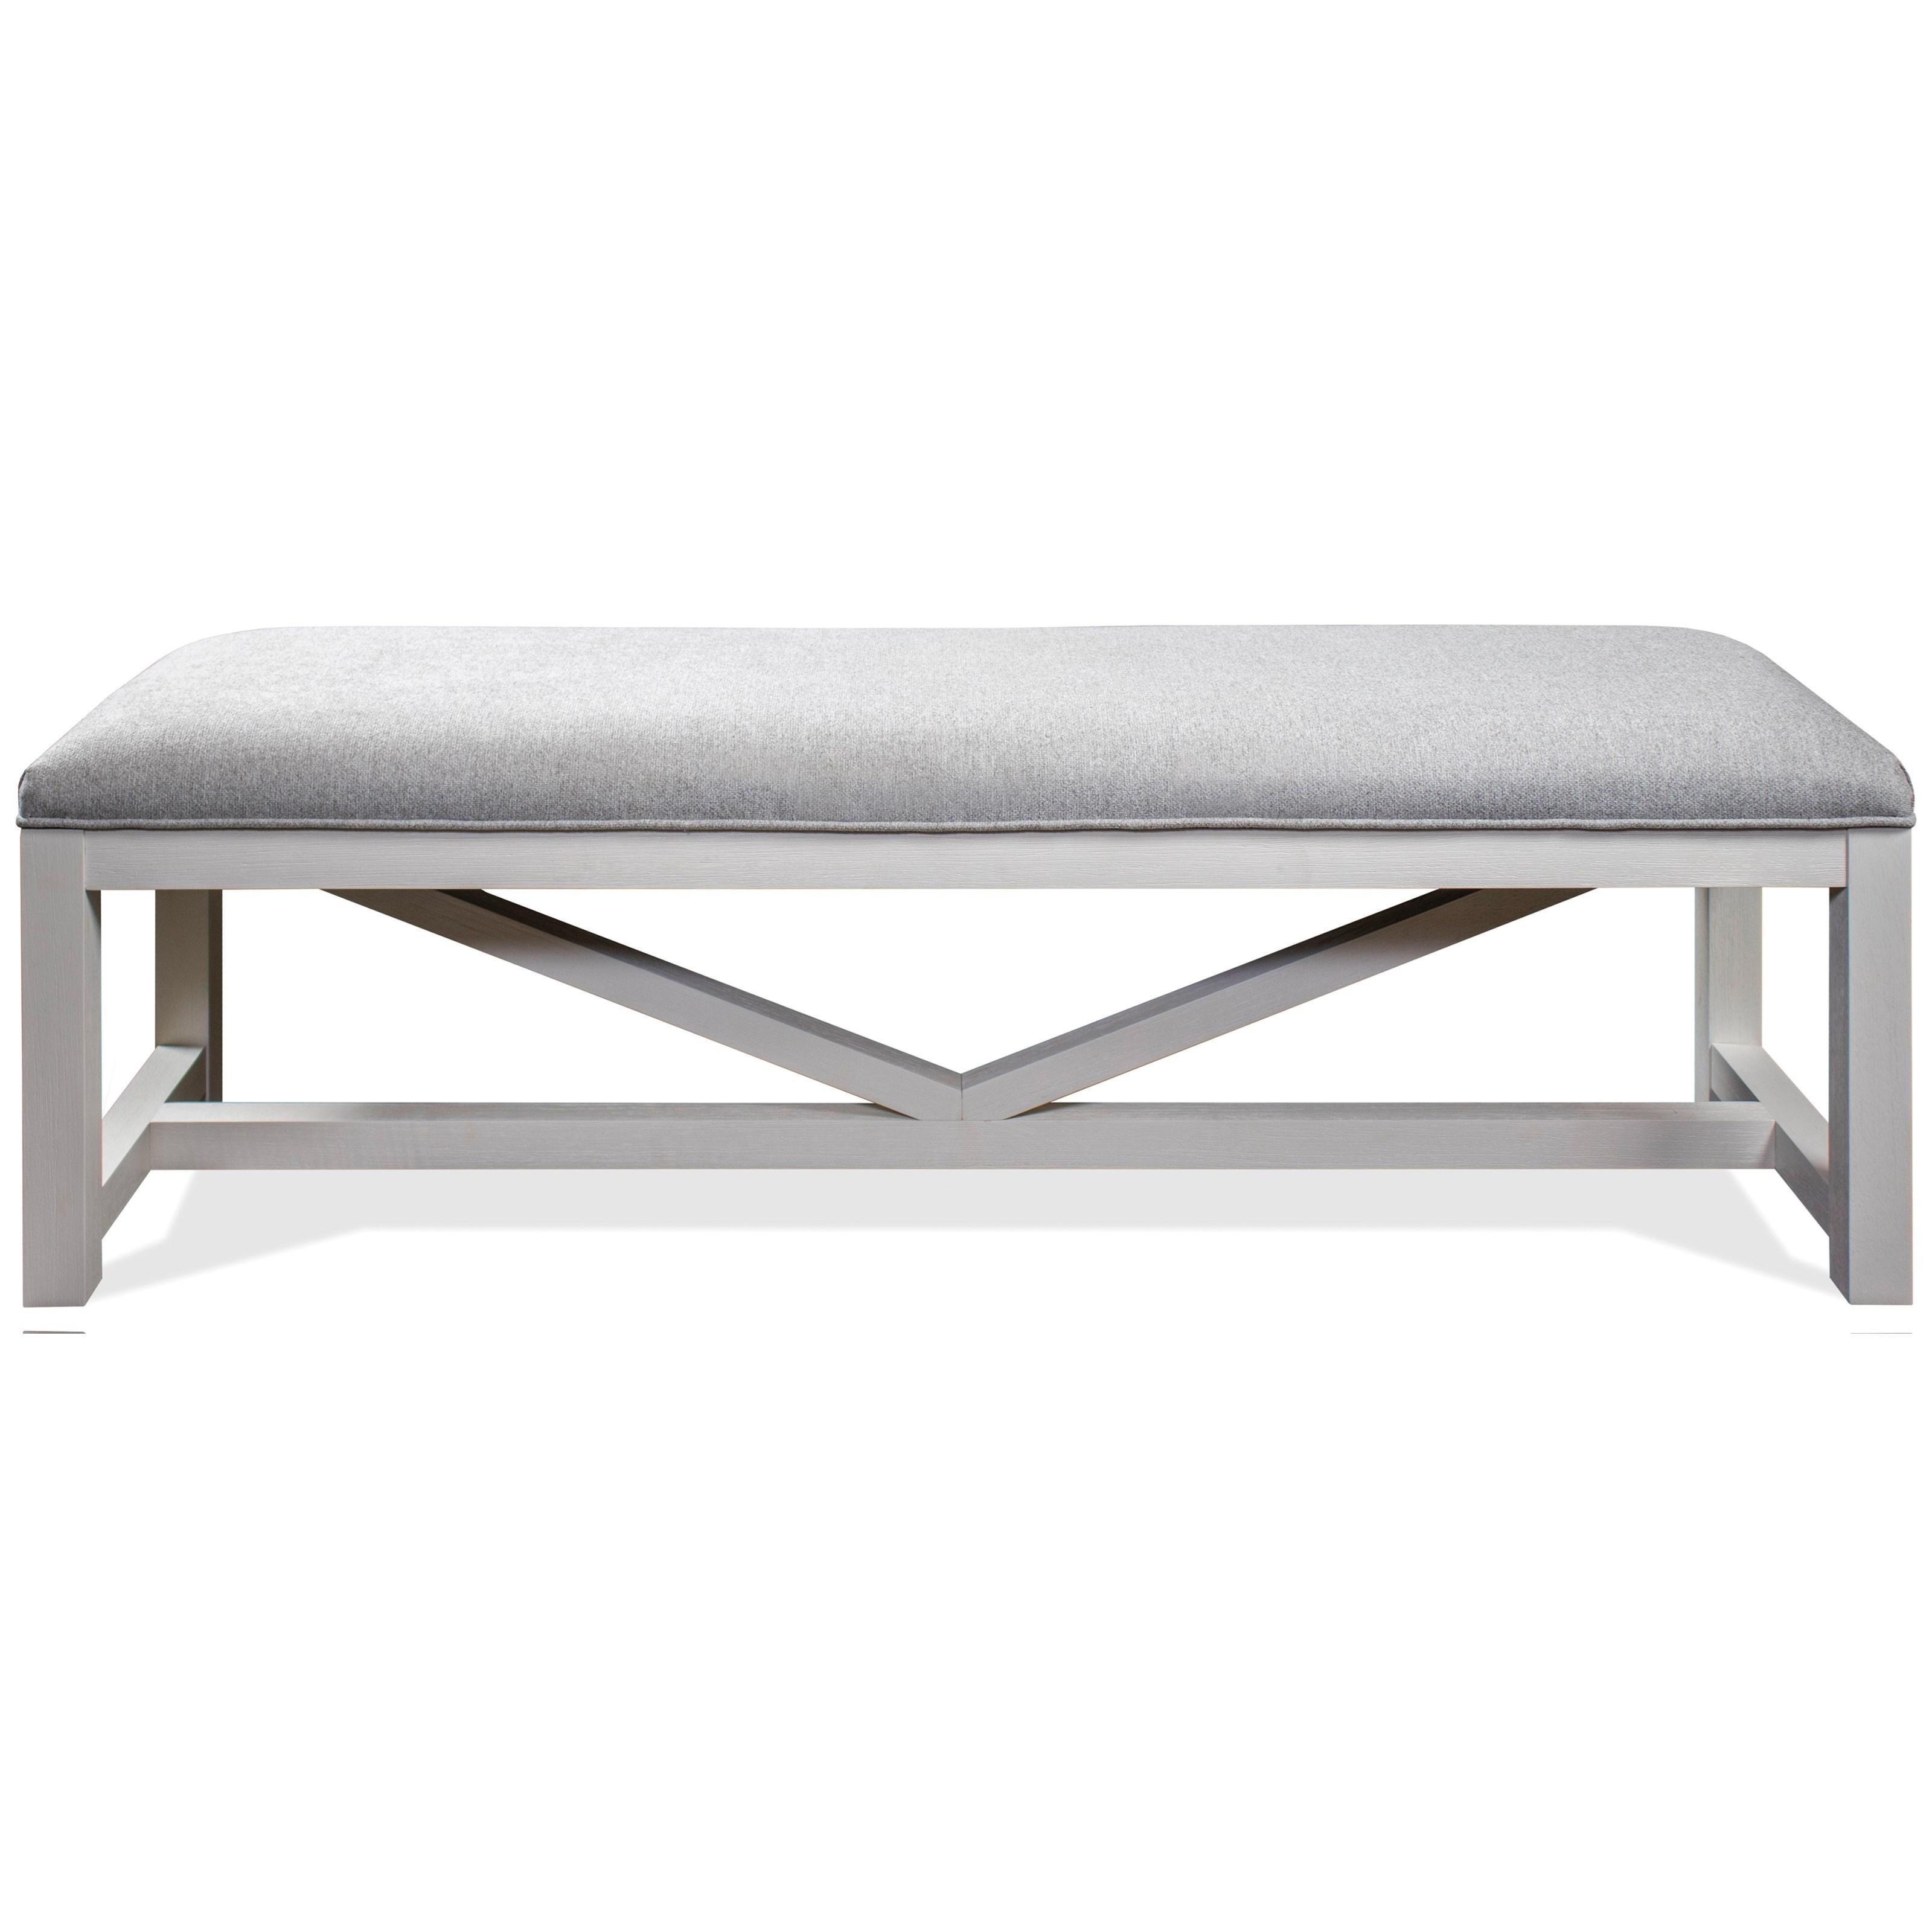 Osborne Upholstered Dining Bench  by Riverside Furniture at Zak's Home